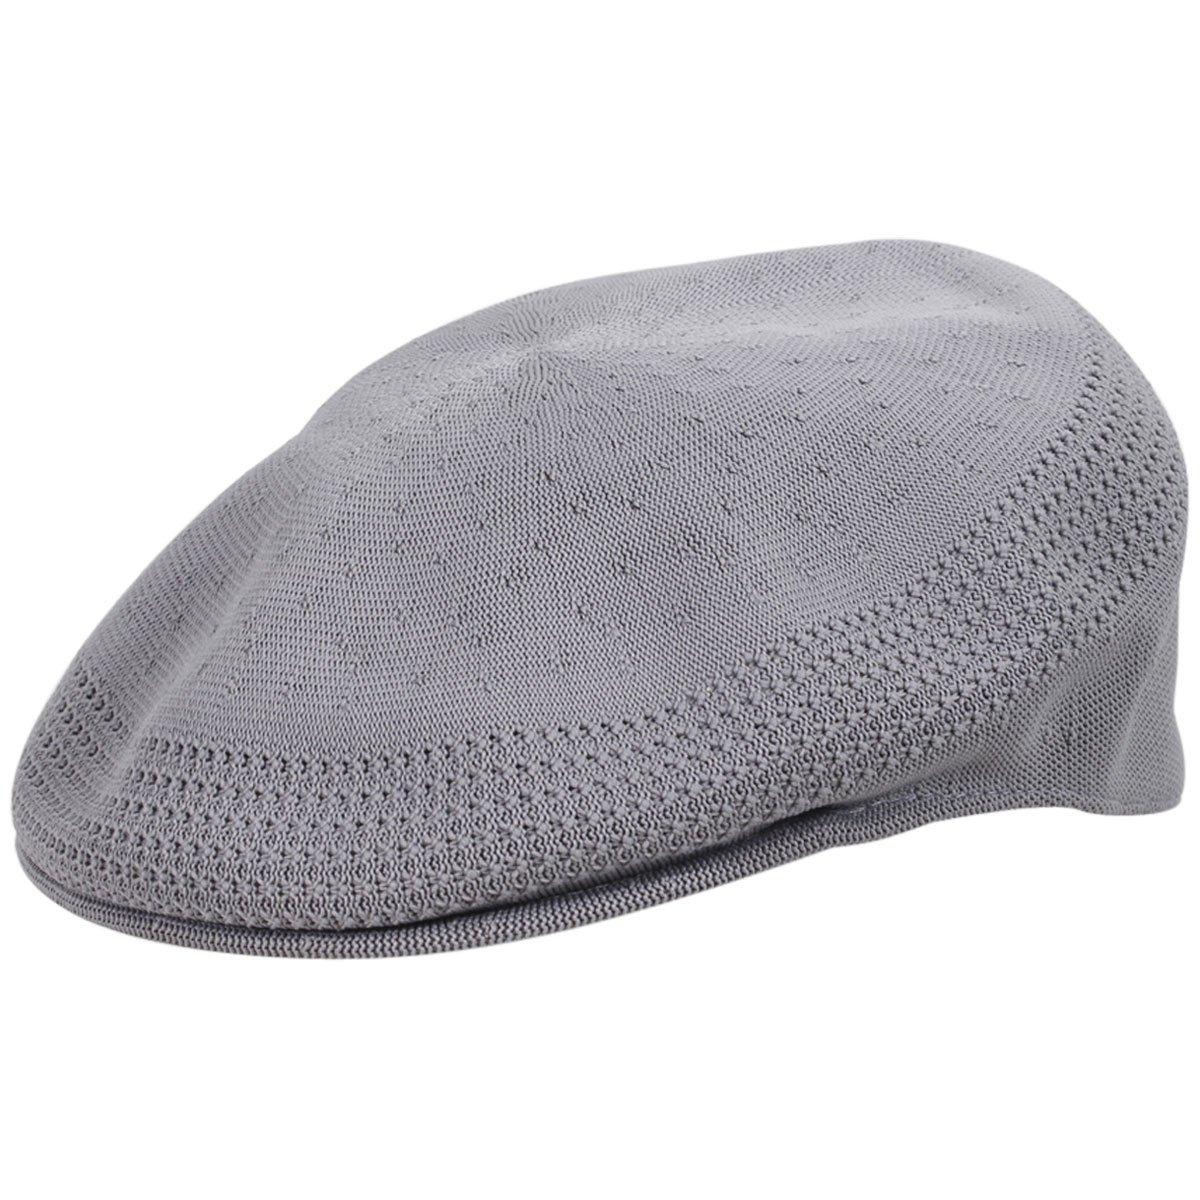 f92757da00acb Kangol Men s Tropic 504 Ventair Flat Cap Hat at Amazon Men s Clothing store